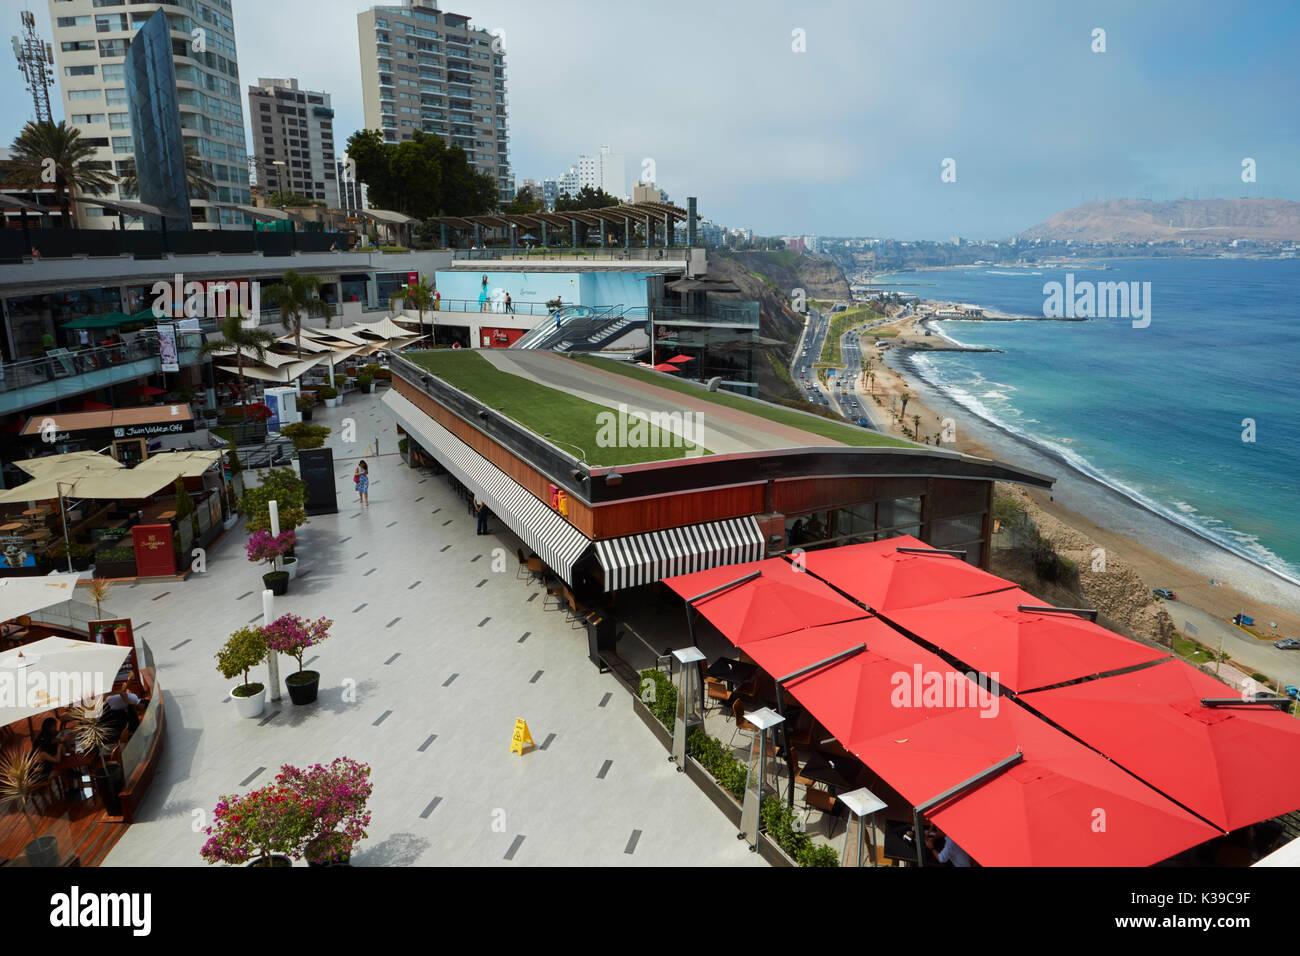 Lacomar cliff-top shopping mall, Miraflores, Lima, Peru, South America - Stock Image